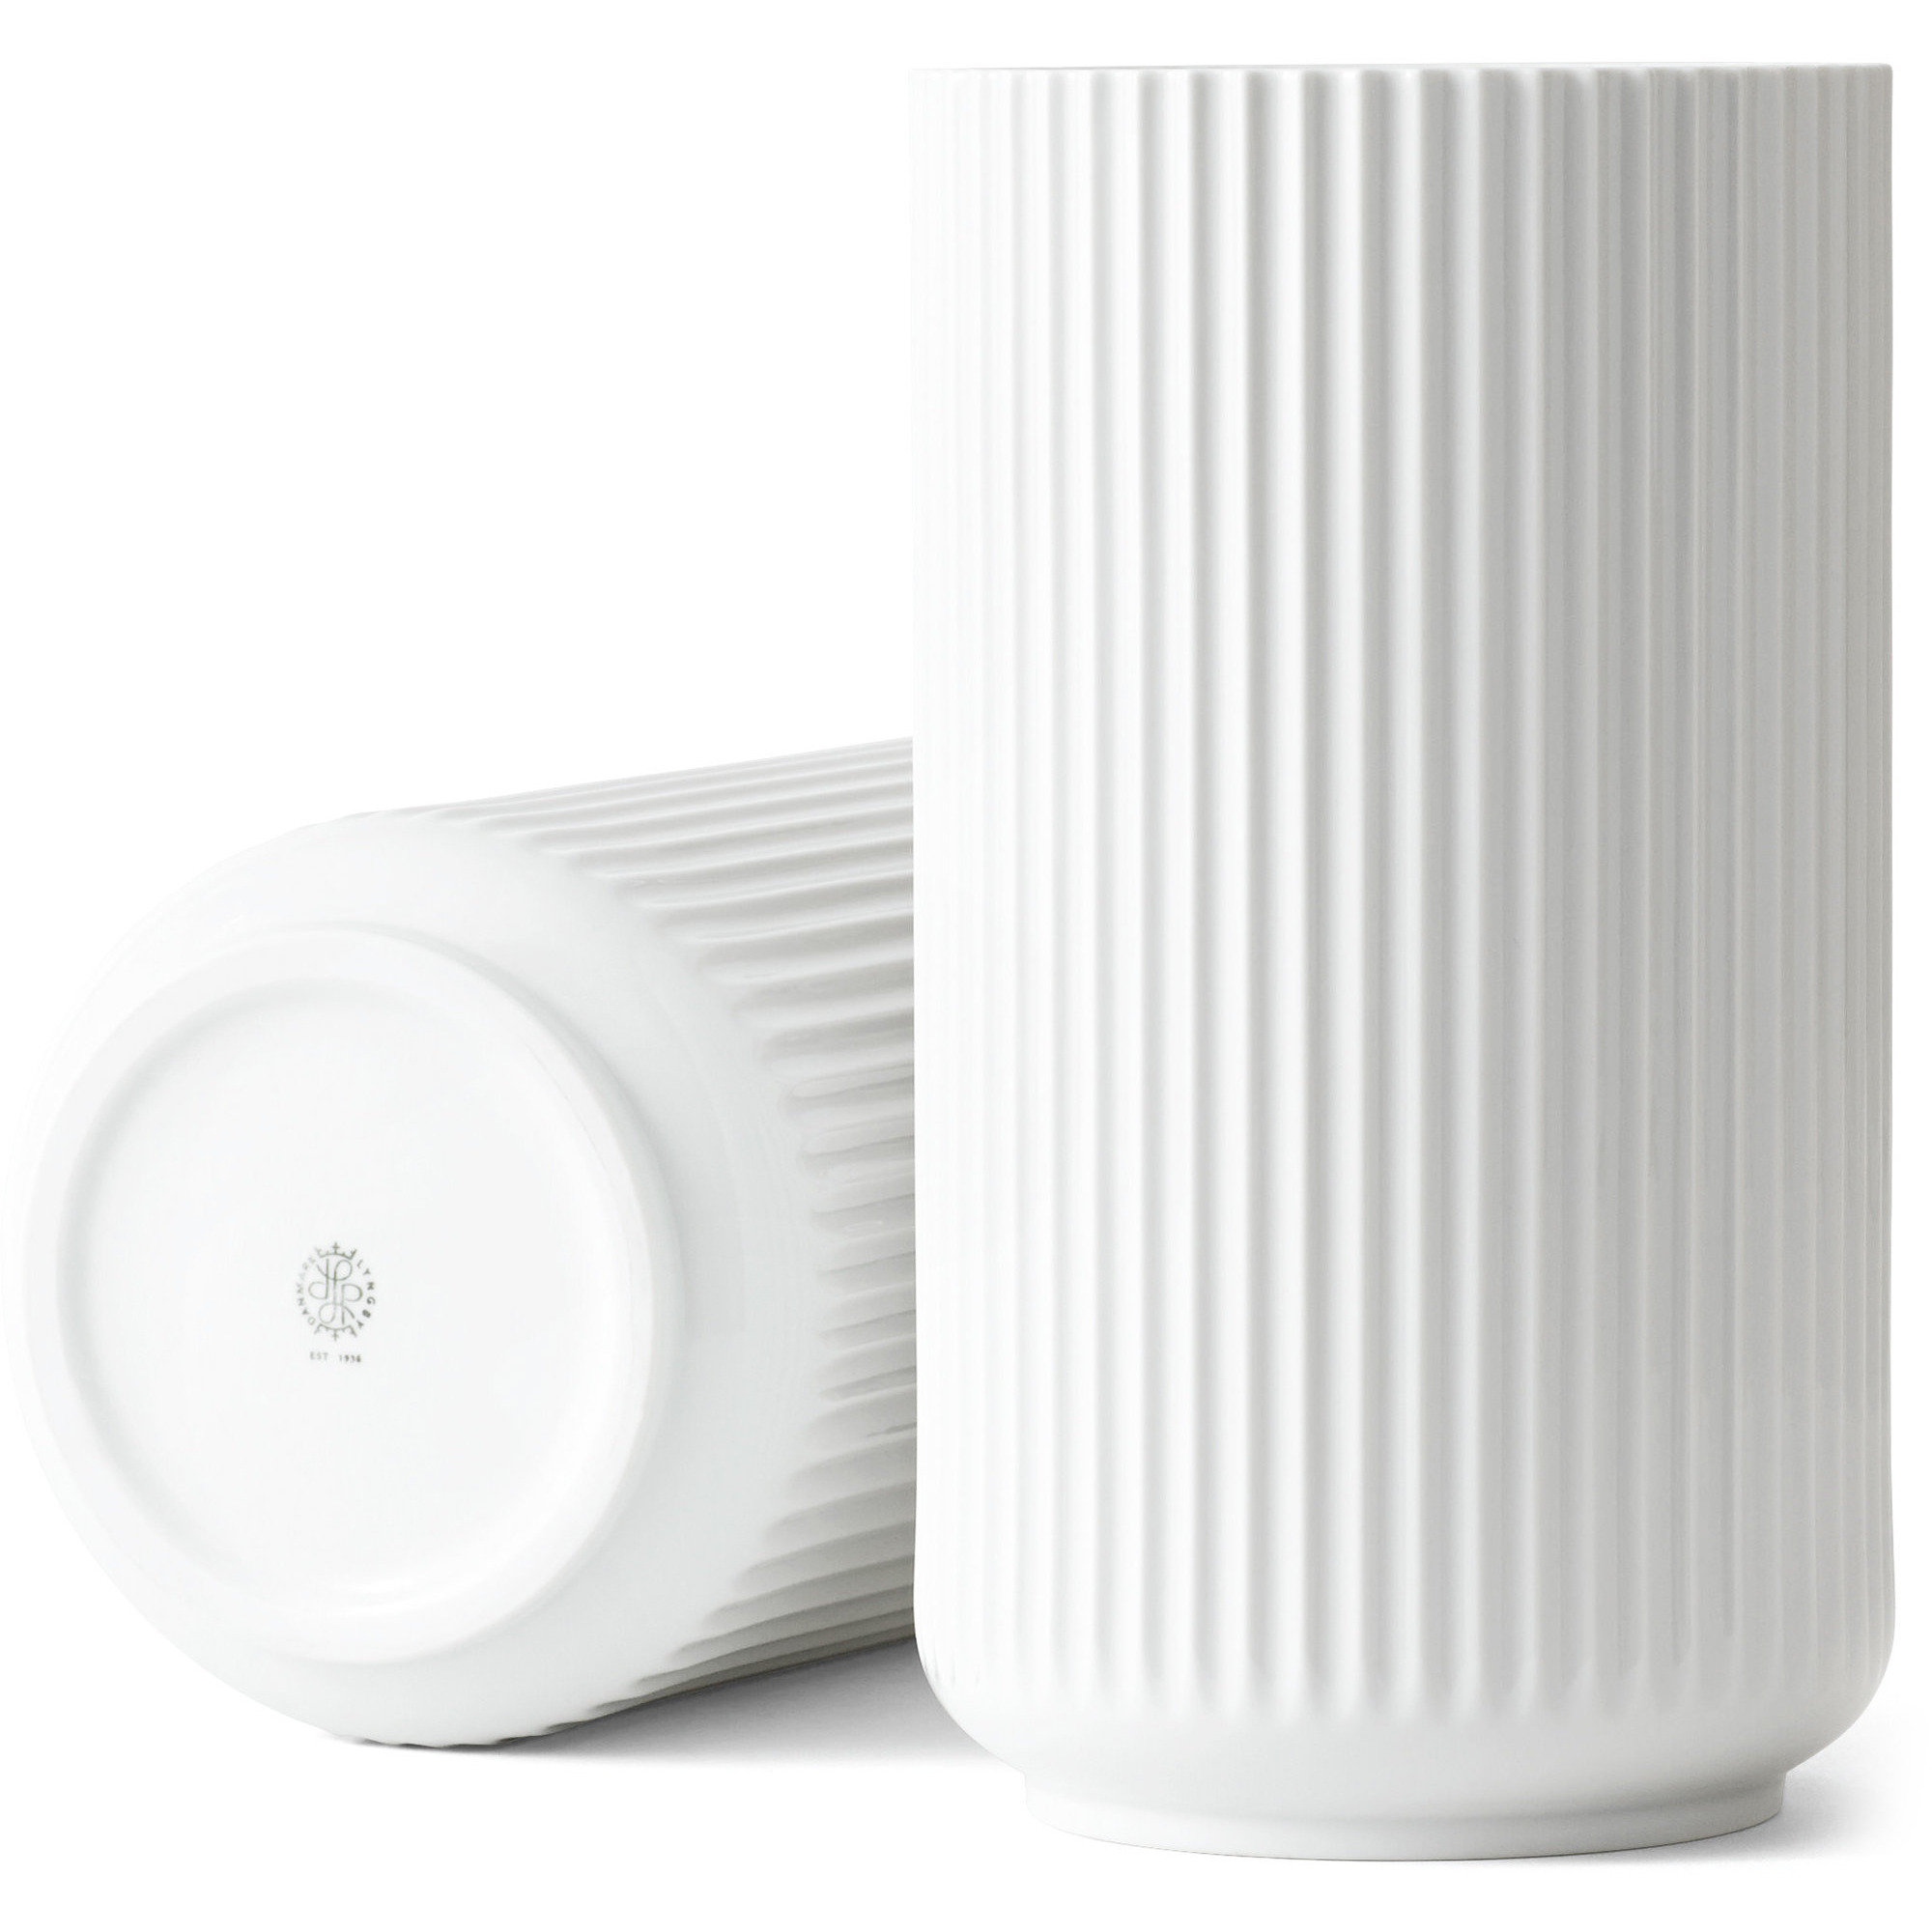 Lyngby Porcelæn Lyngbyvasen 31 cm. porslin – vit